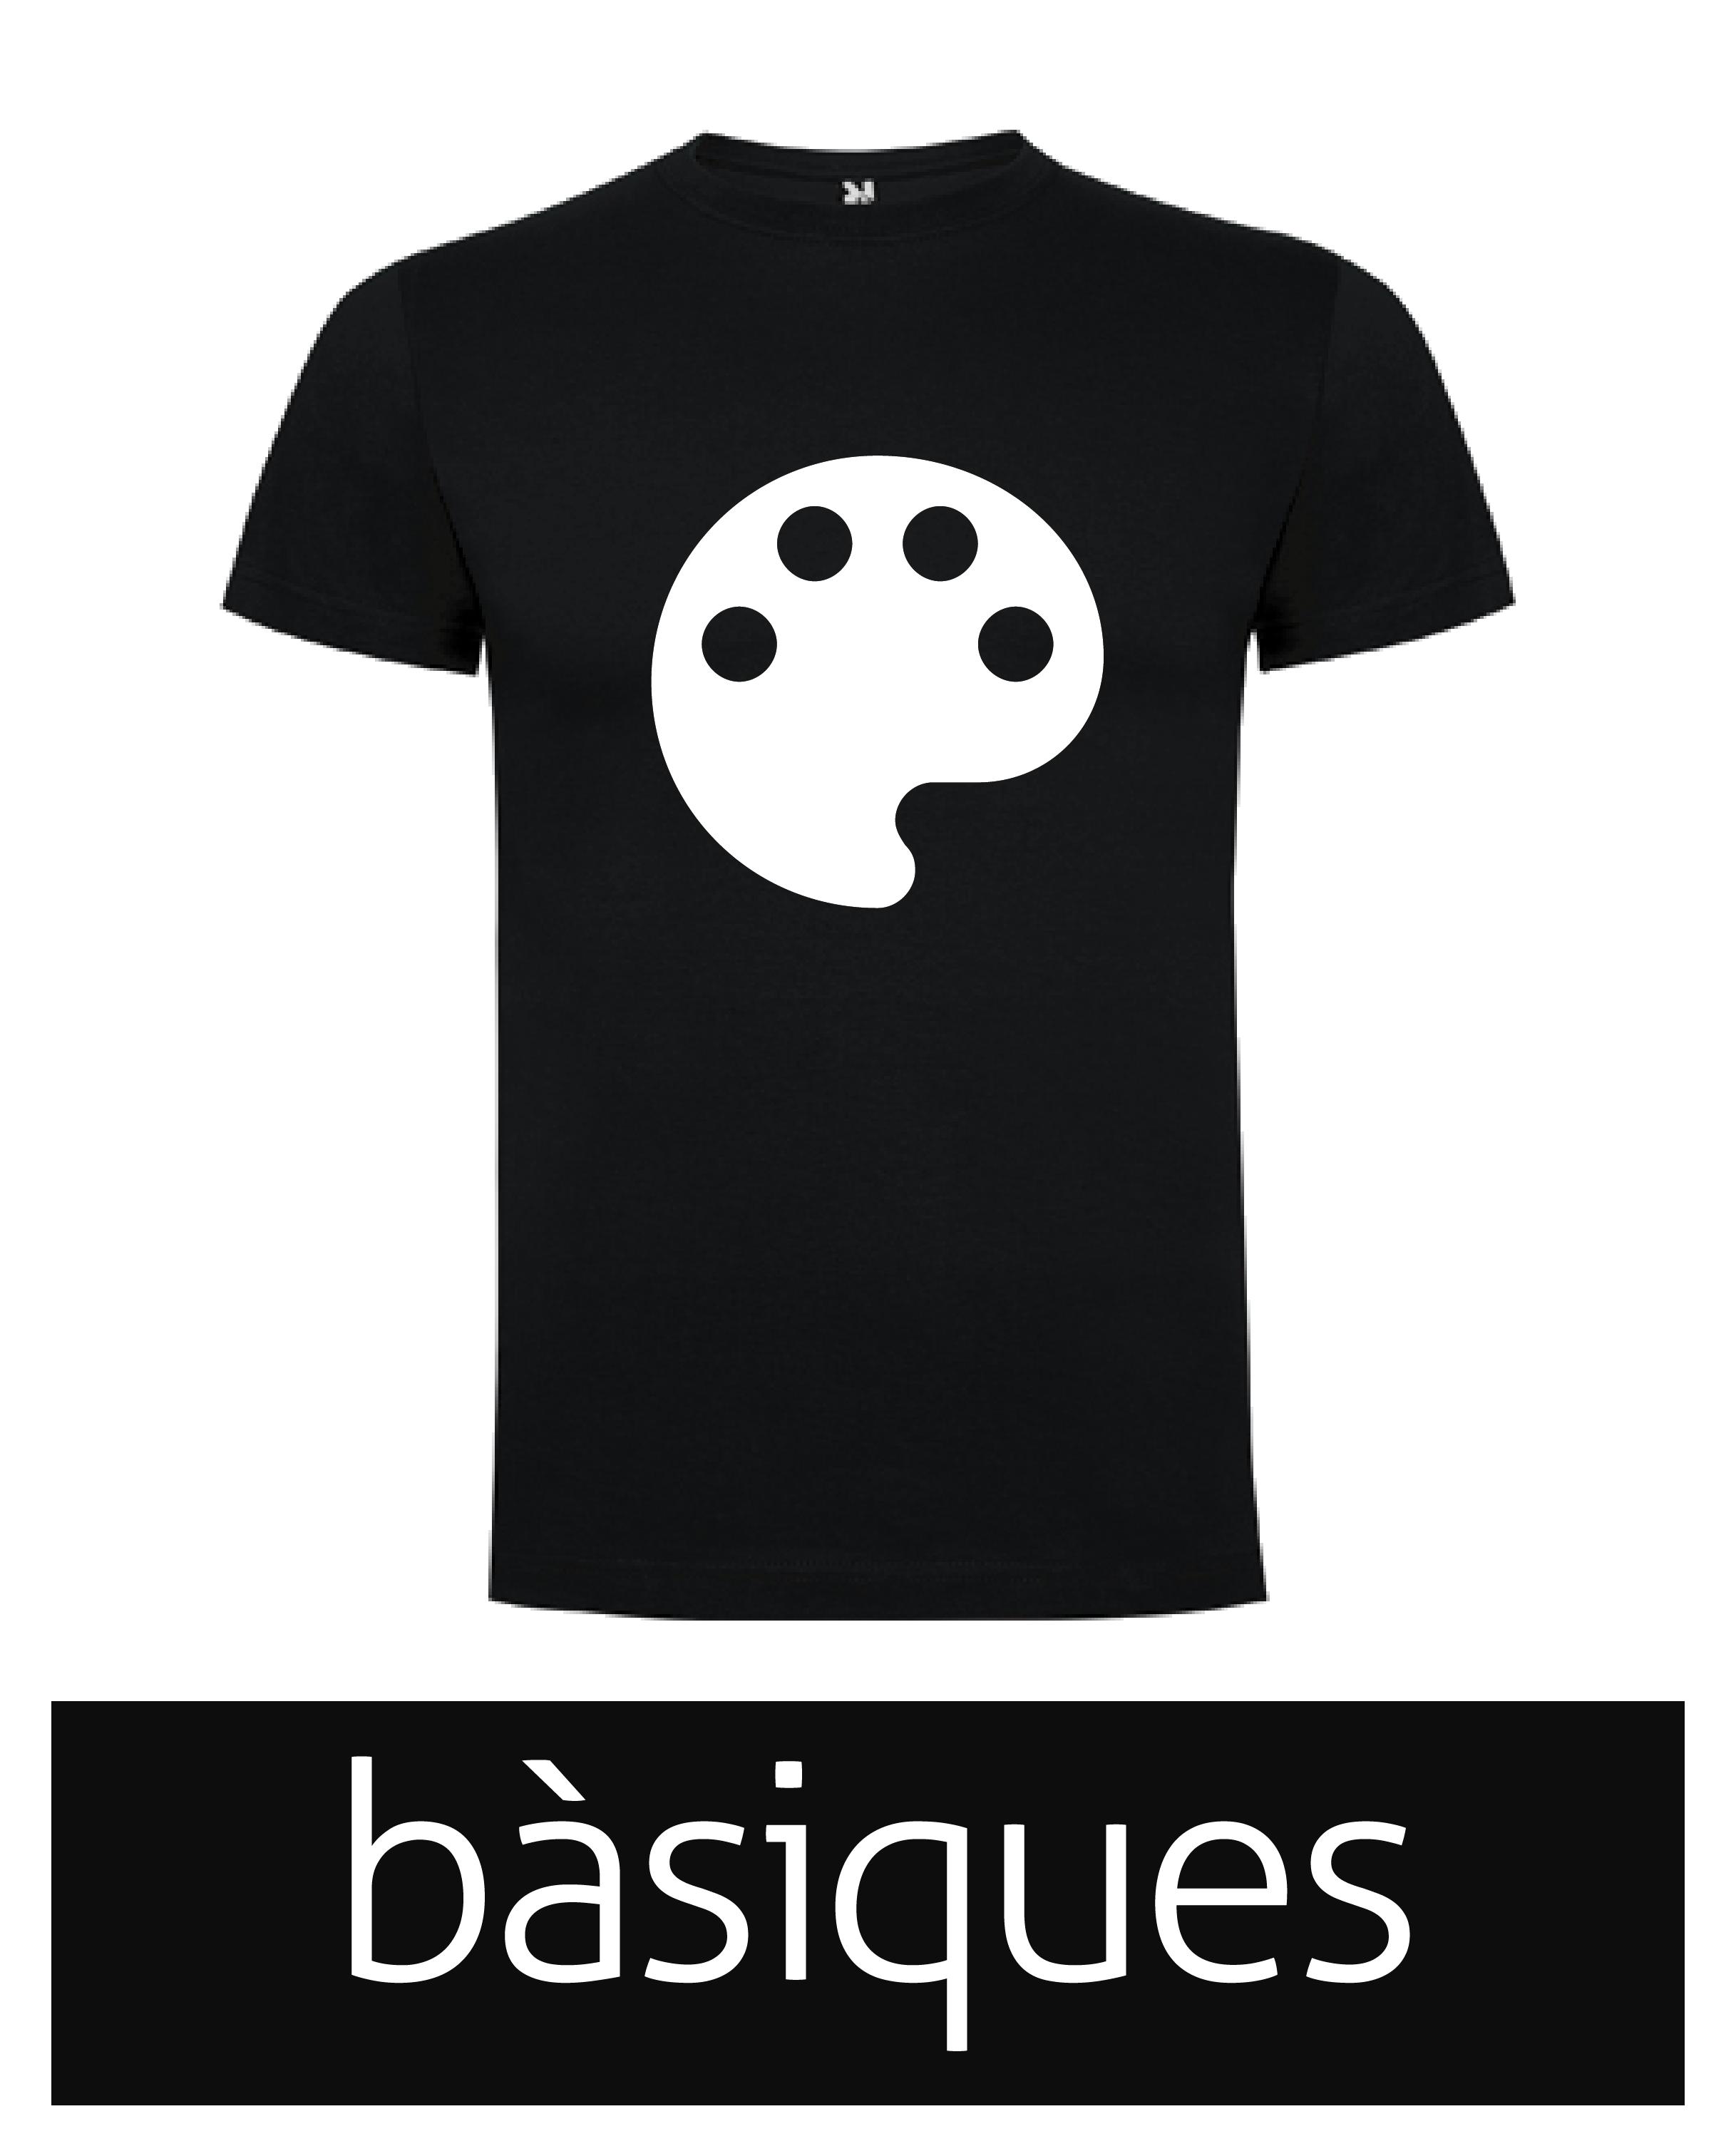 basiques.png